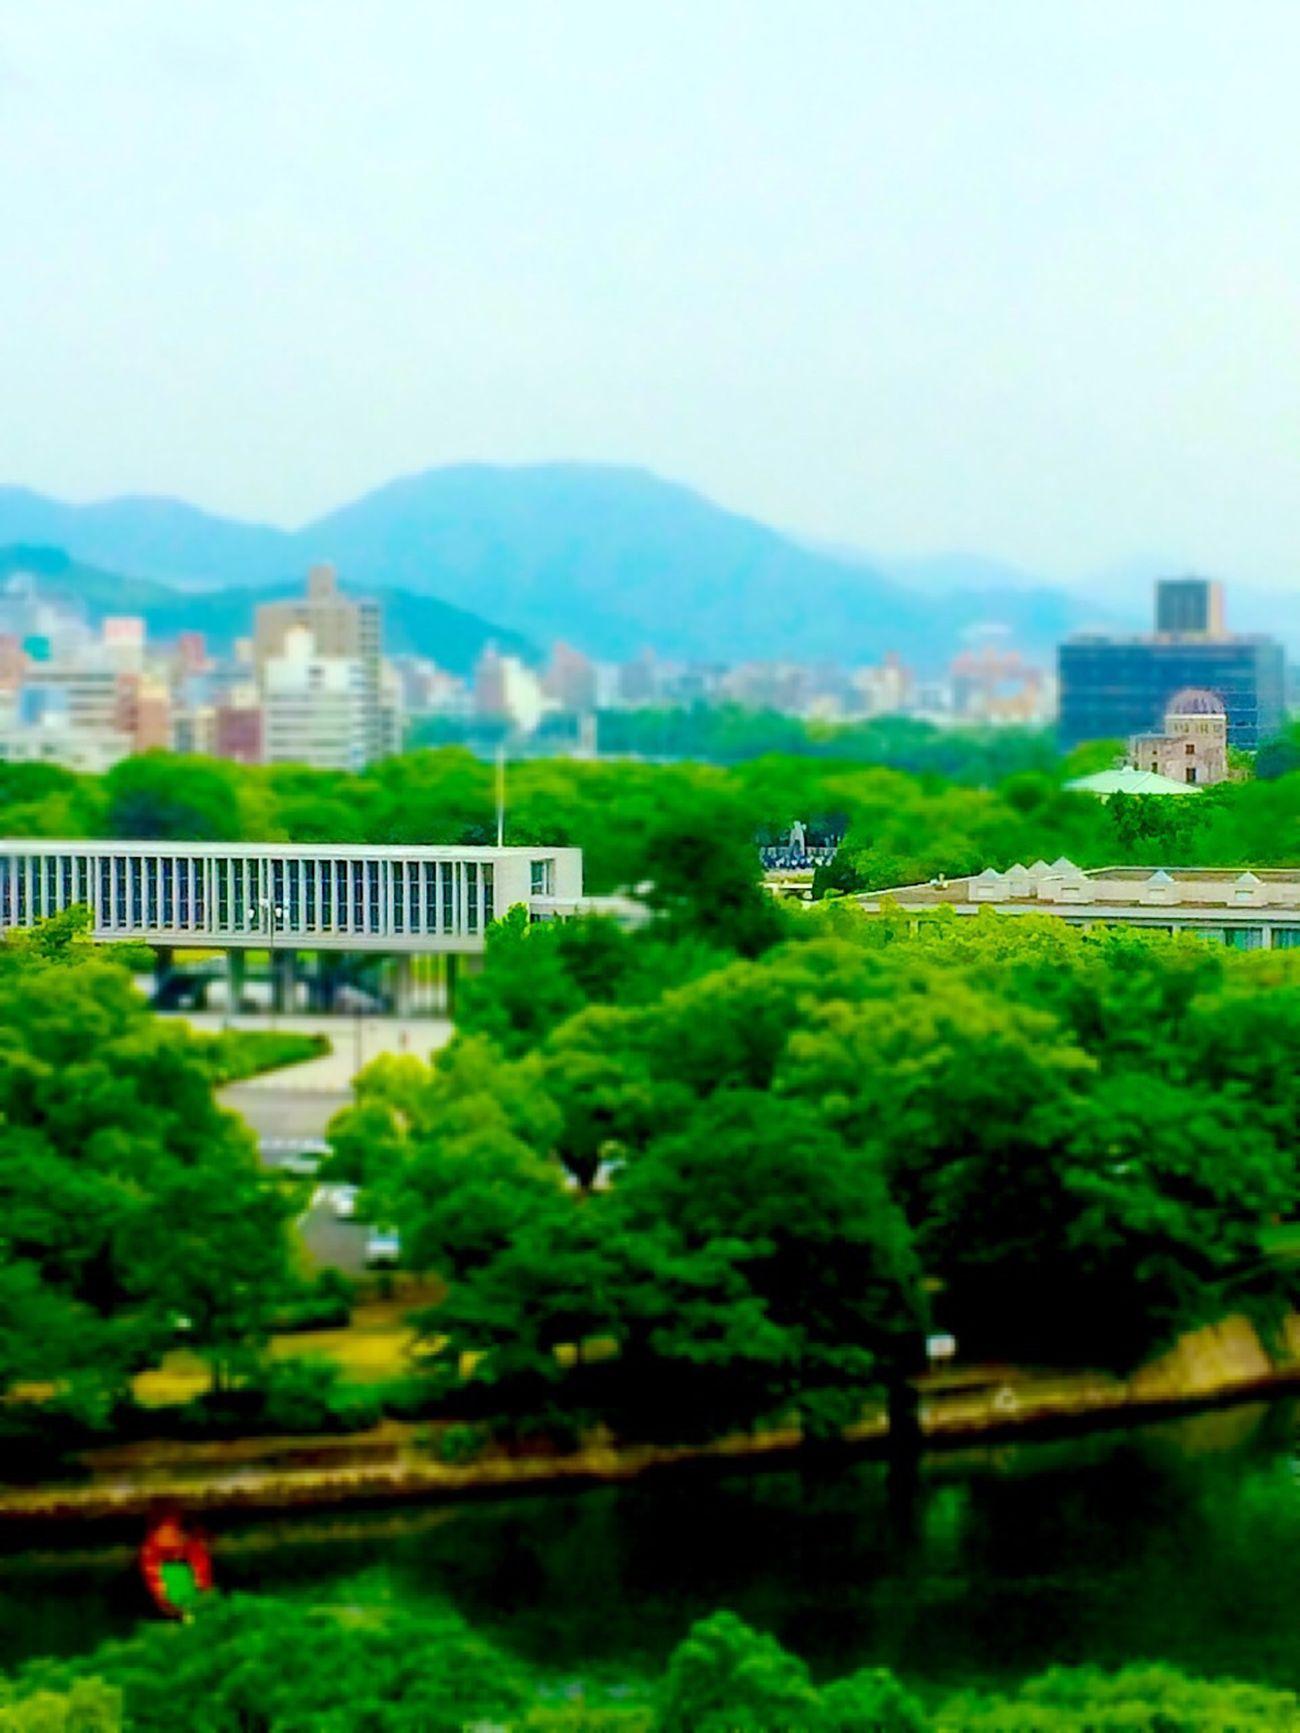 A-Bomb Dome Hiroshima Peace Memorial Park